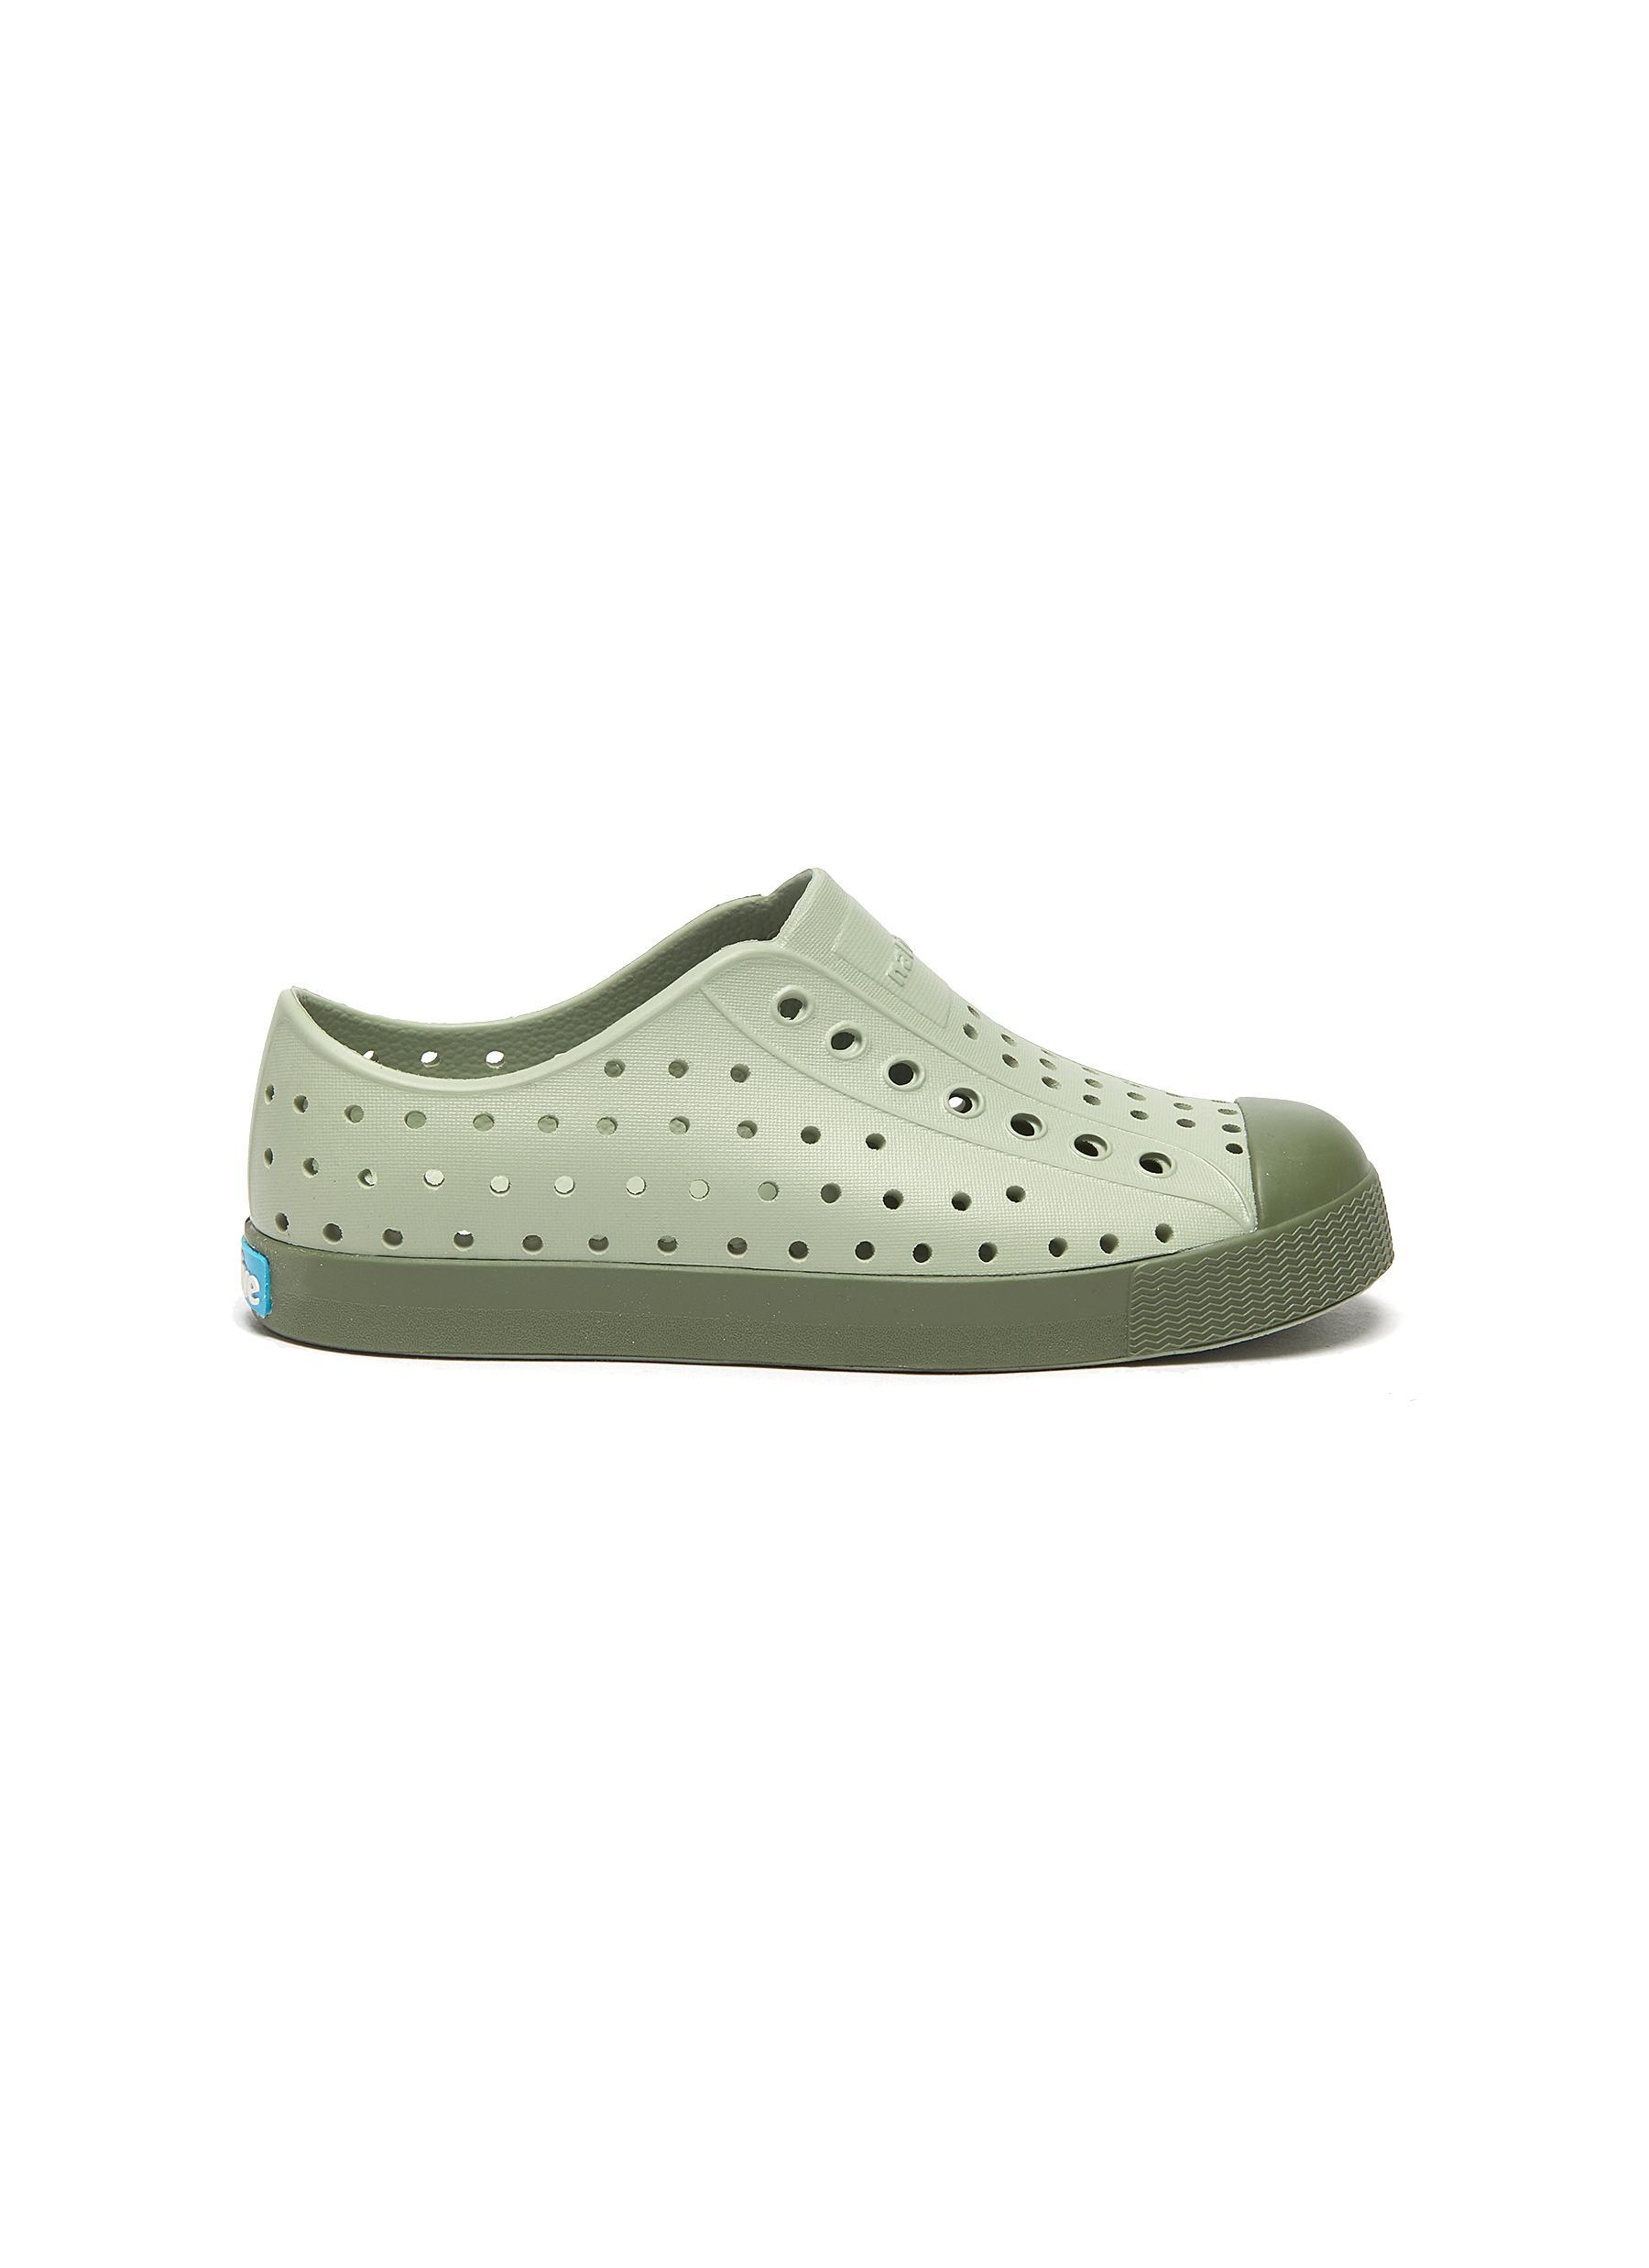 Jefferson' perforated kid slip-on sneakers - NATIVE - Modalova